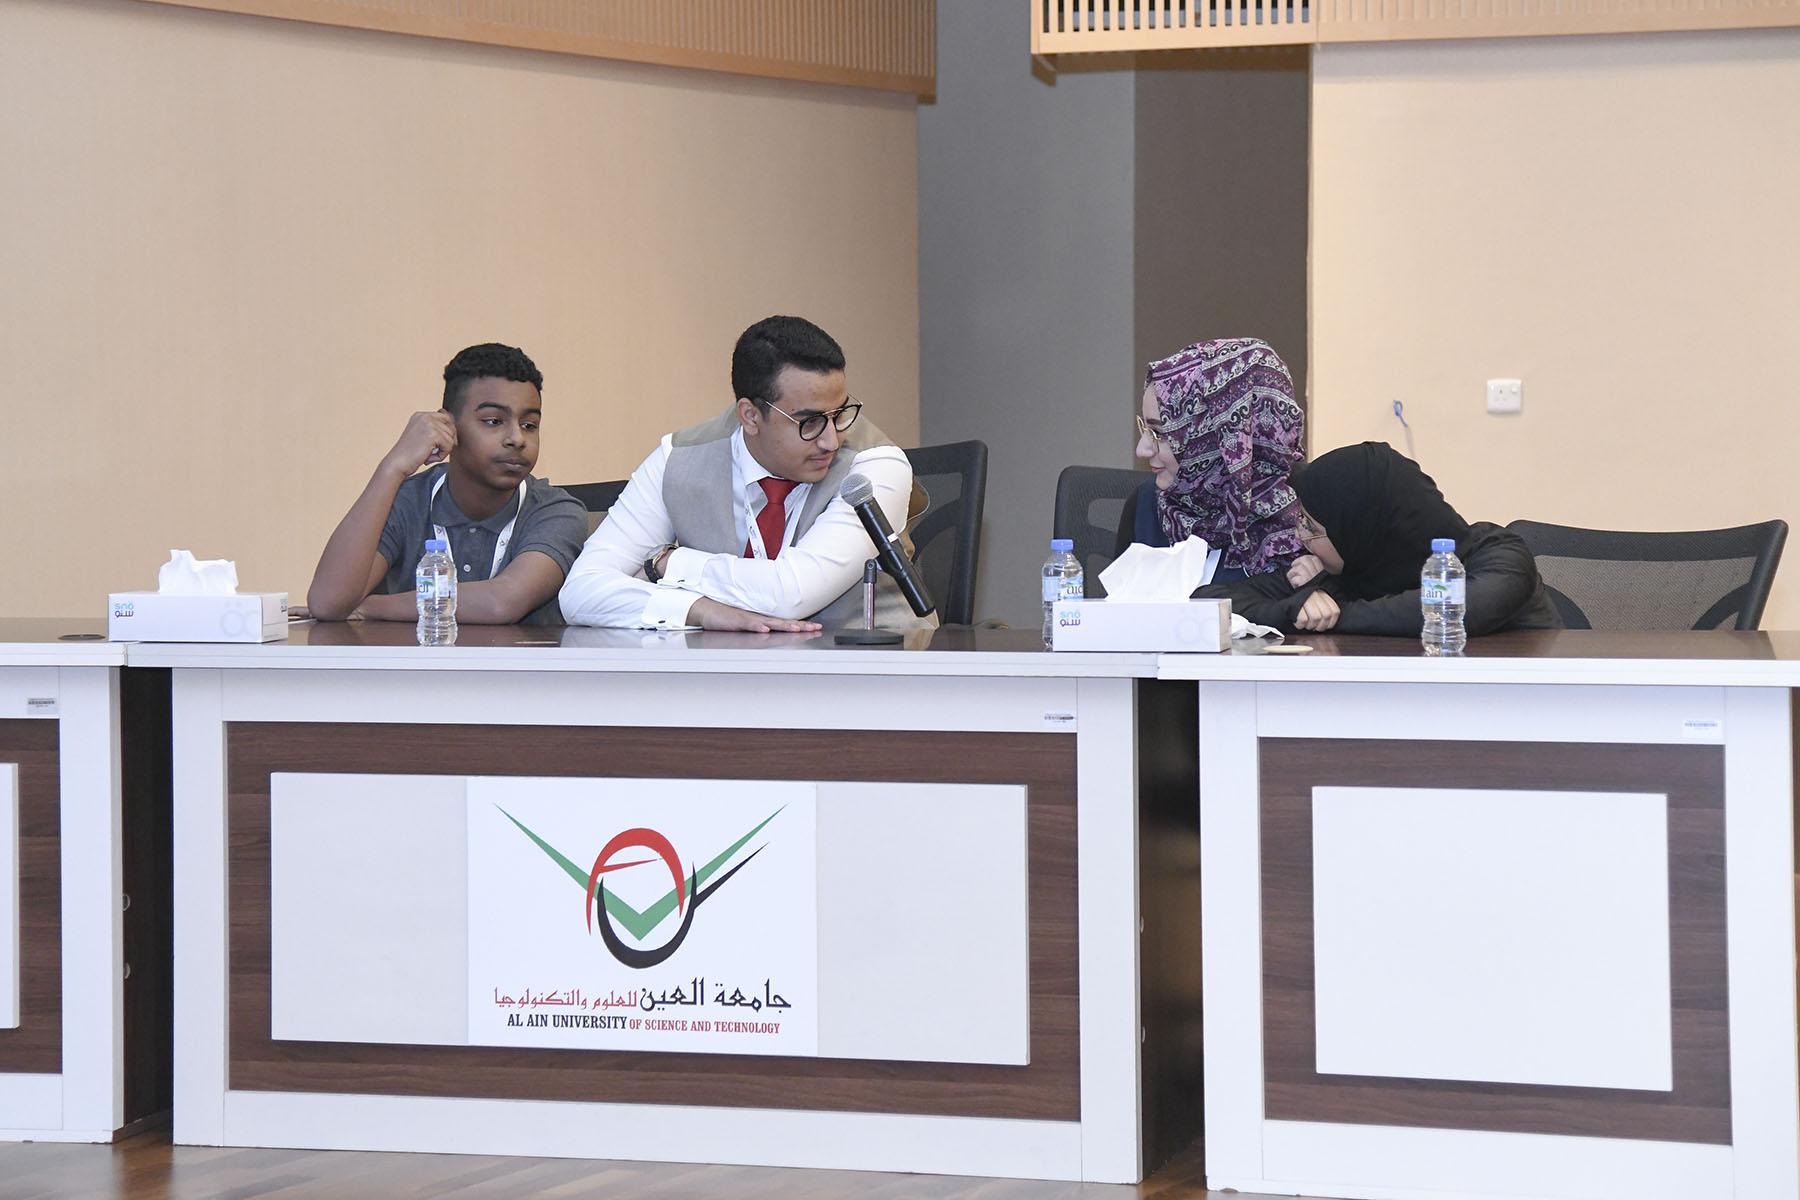 Tenth Day (Dar Al Uloom Private School - Bani Yas VS Ashbal Al Quds Private Secondary School)